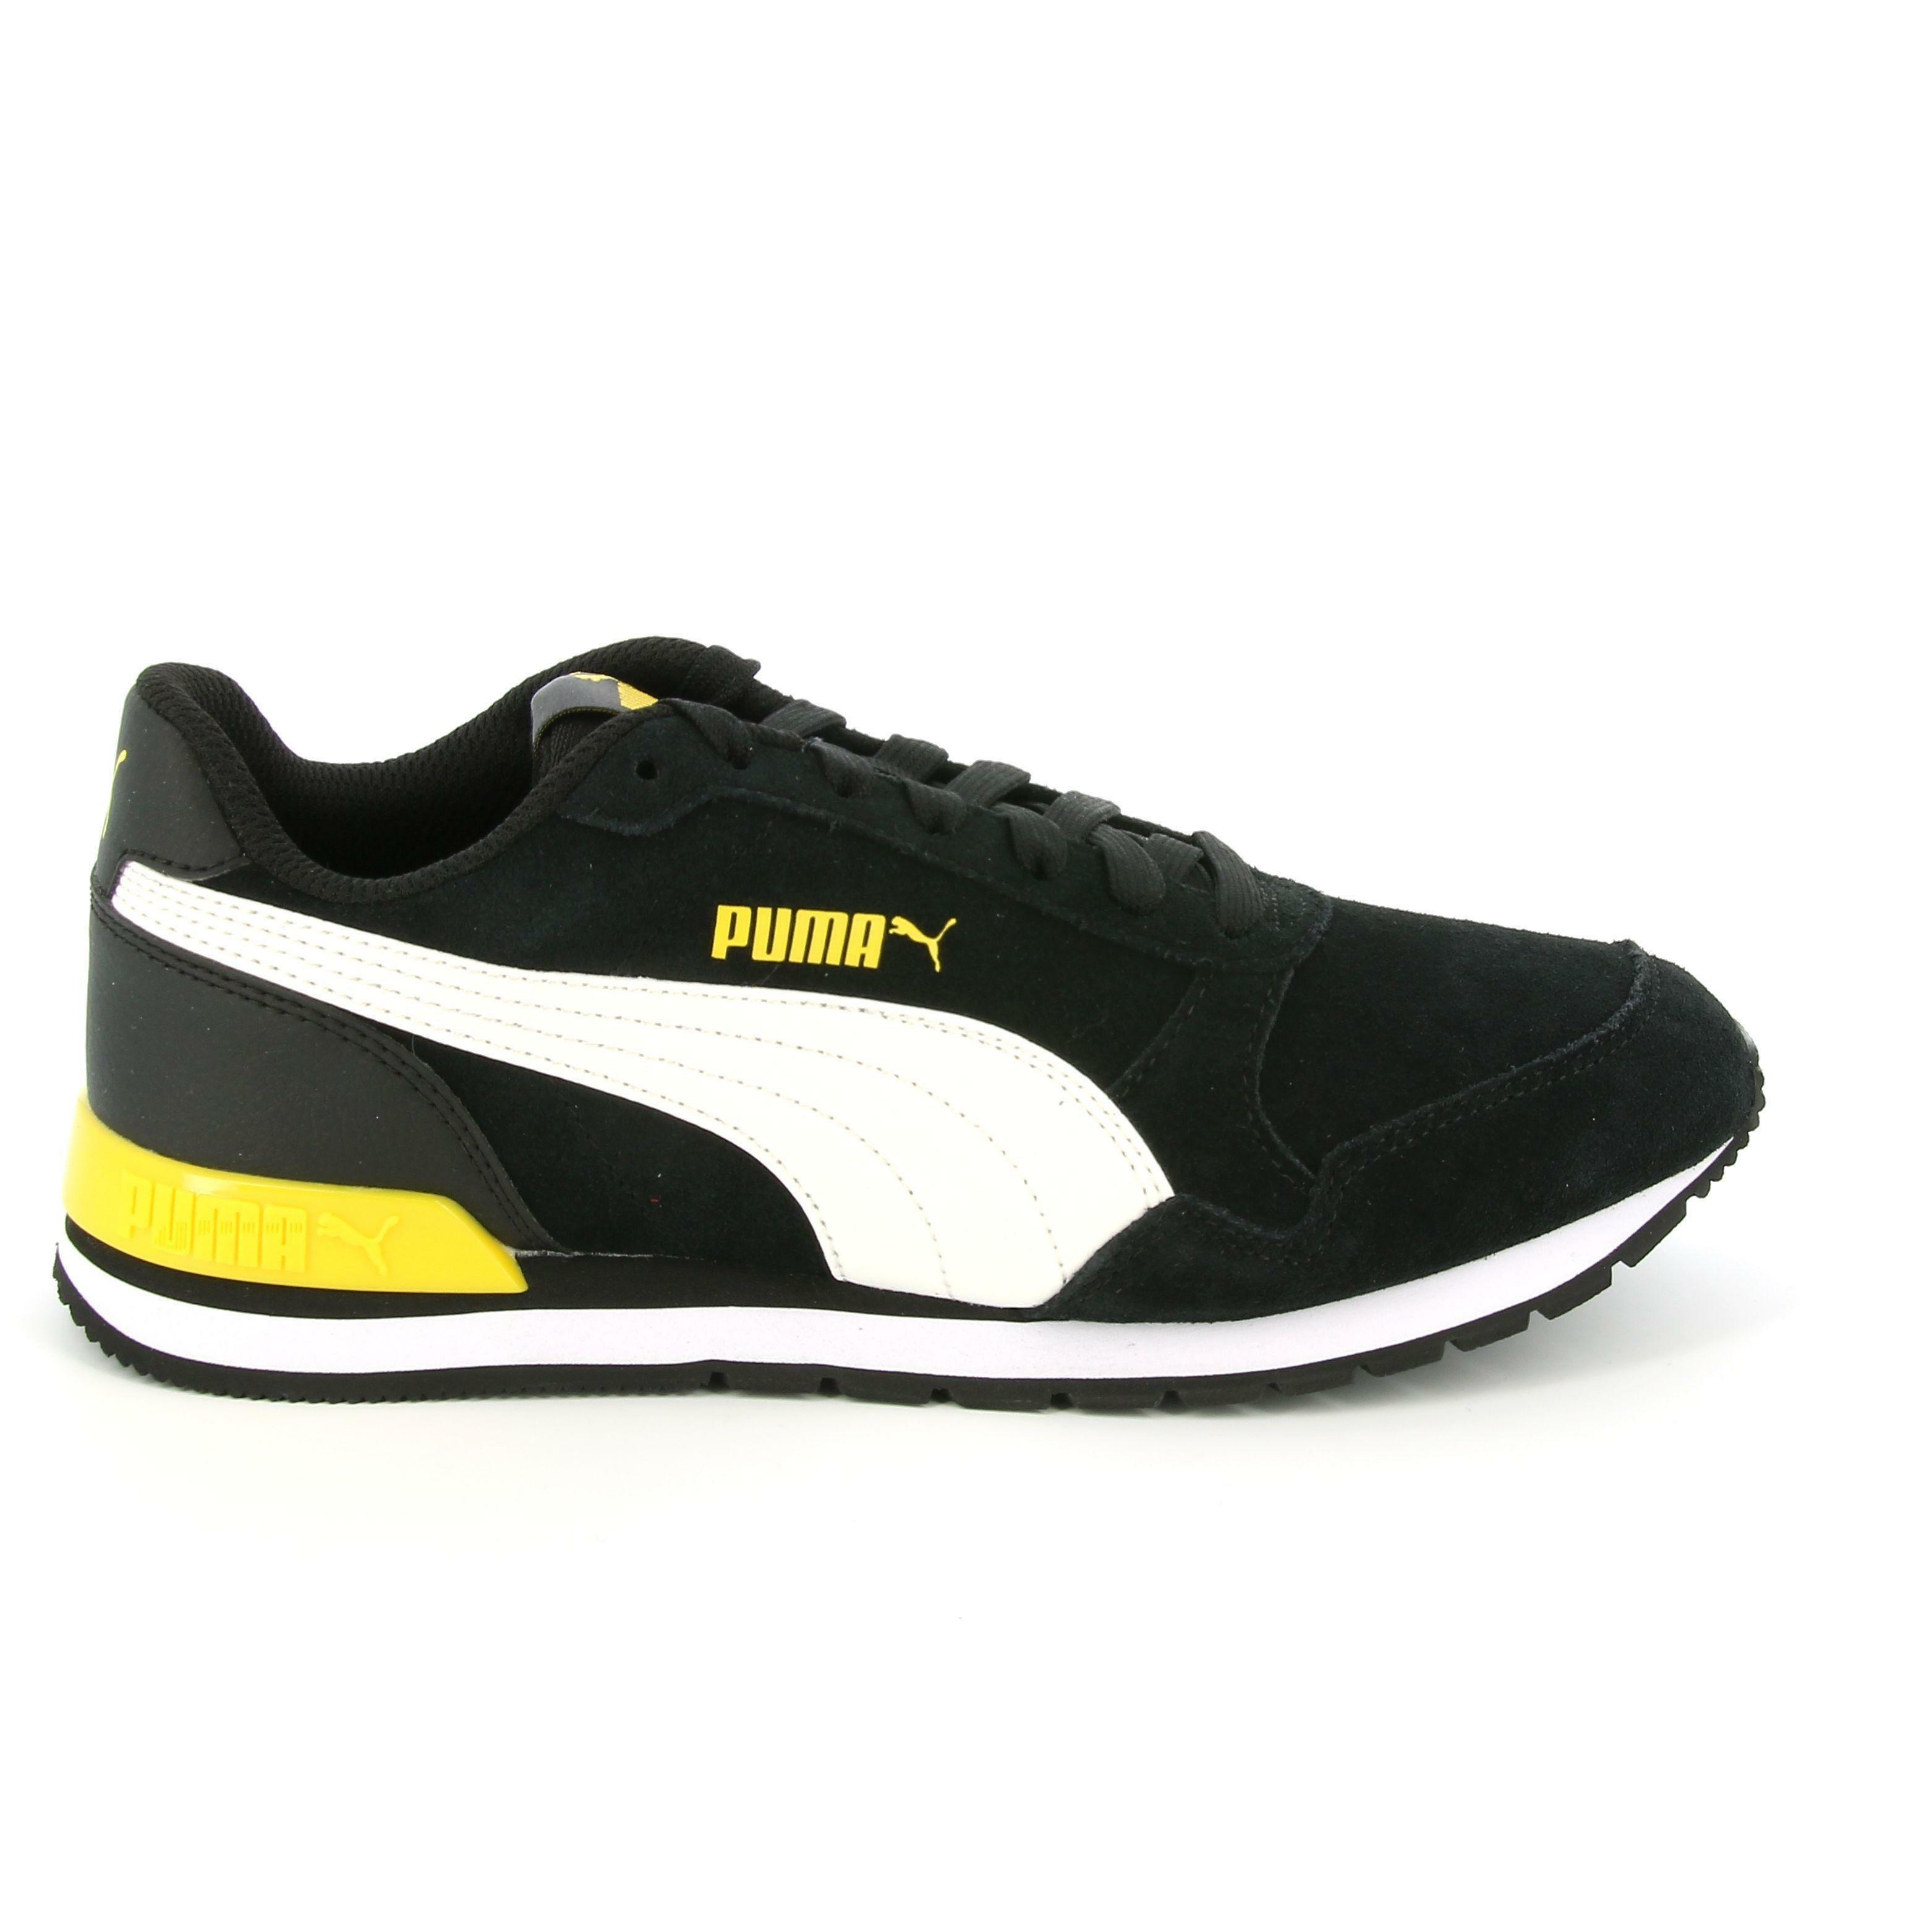 puma puma st runner v2 sd jr 366000 008 scarpa sportiva unisex adulto nero